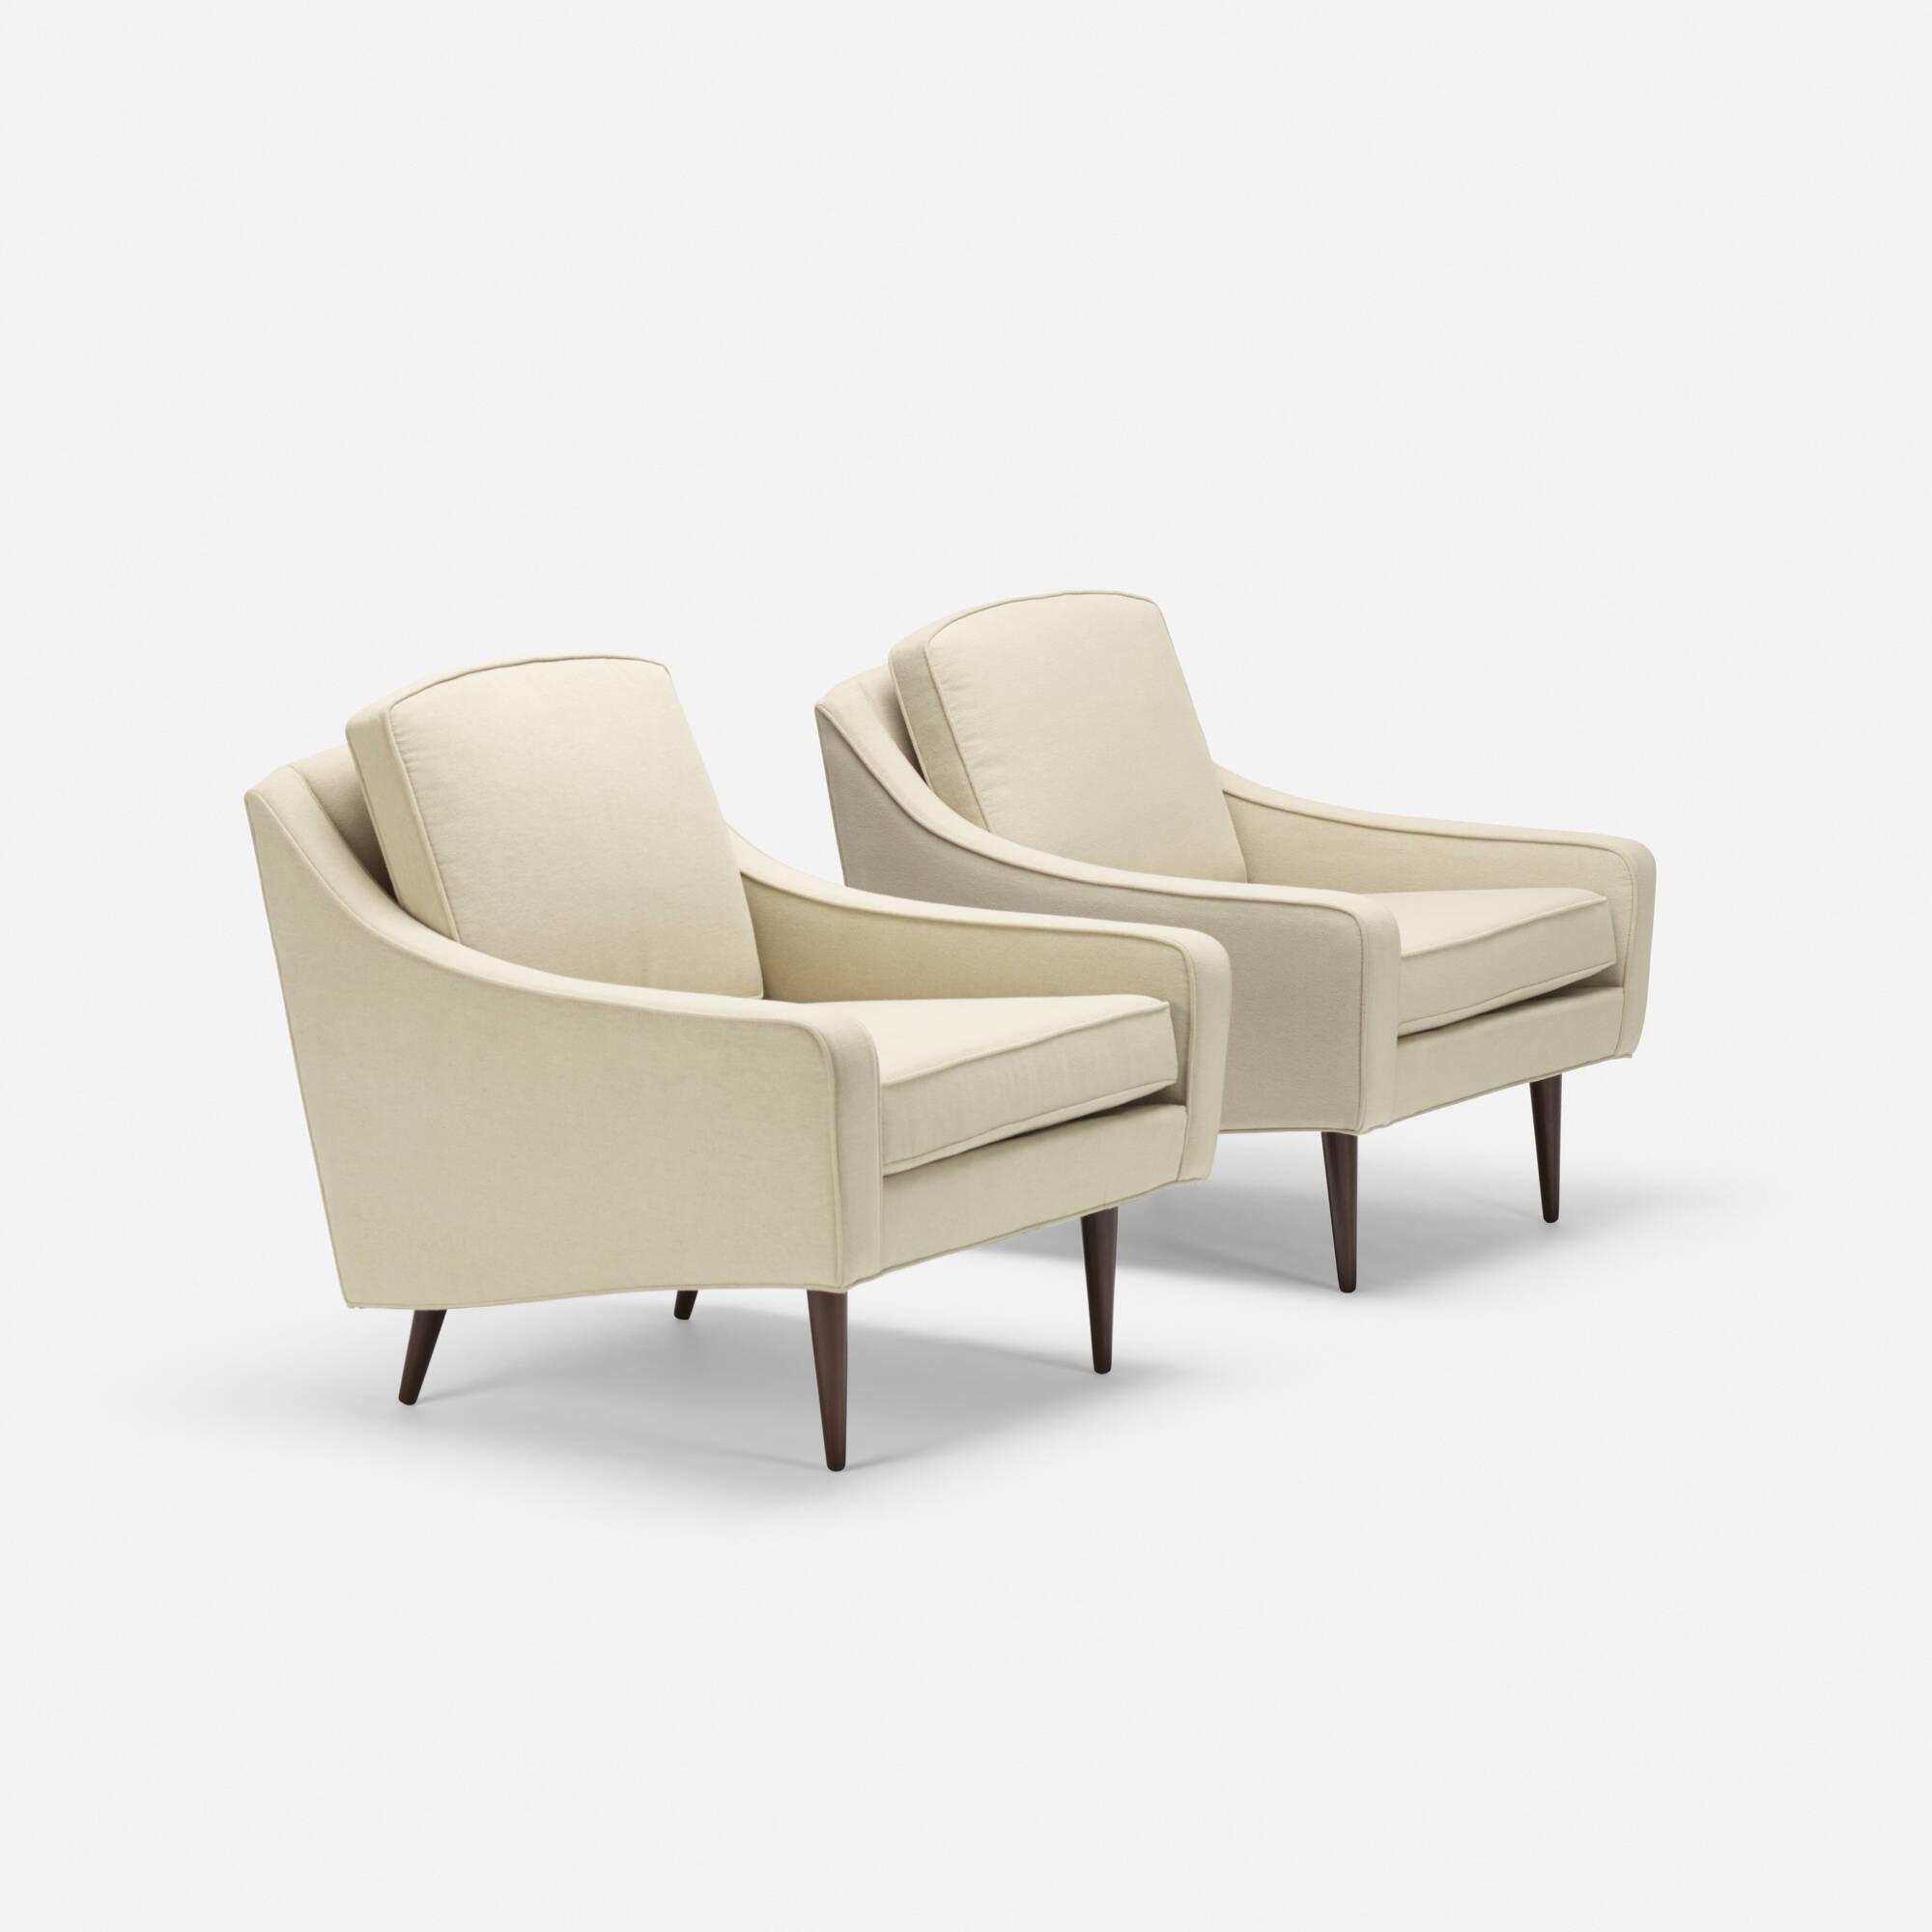 168: Milo Baughman / lounge chairs, pair (1 of 4)